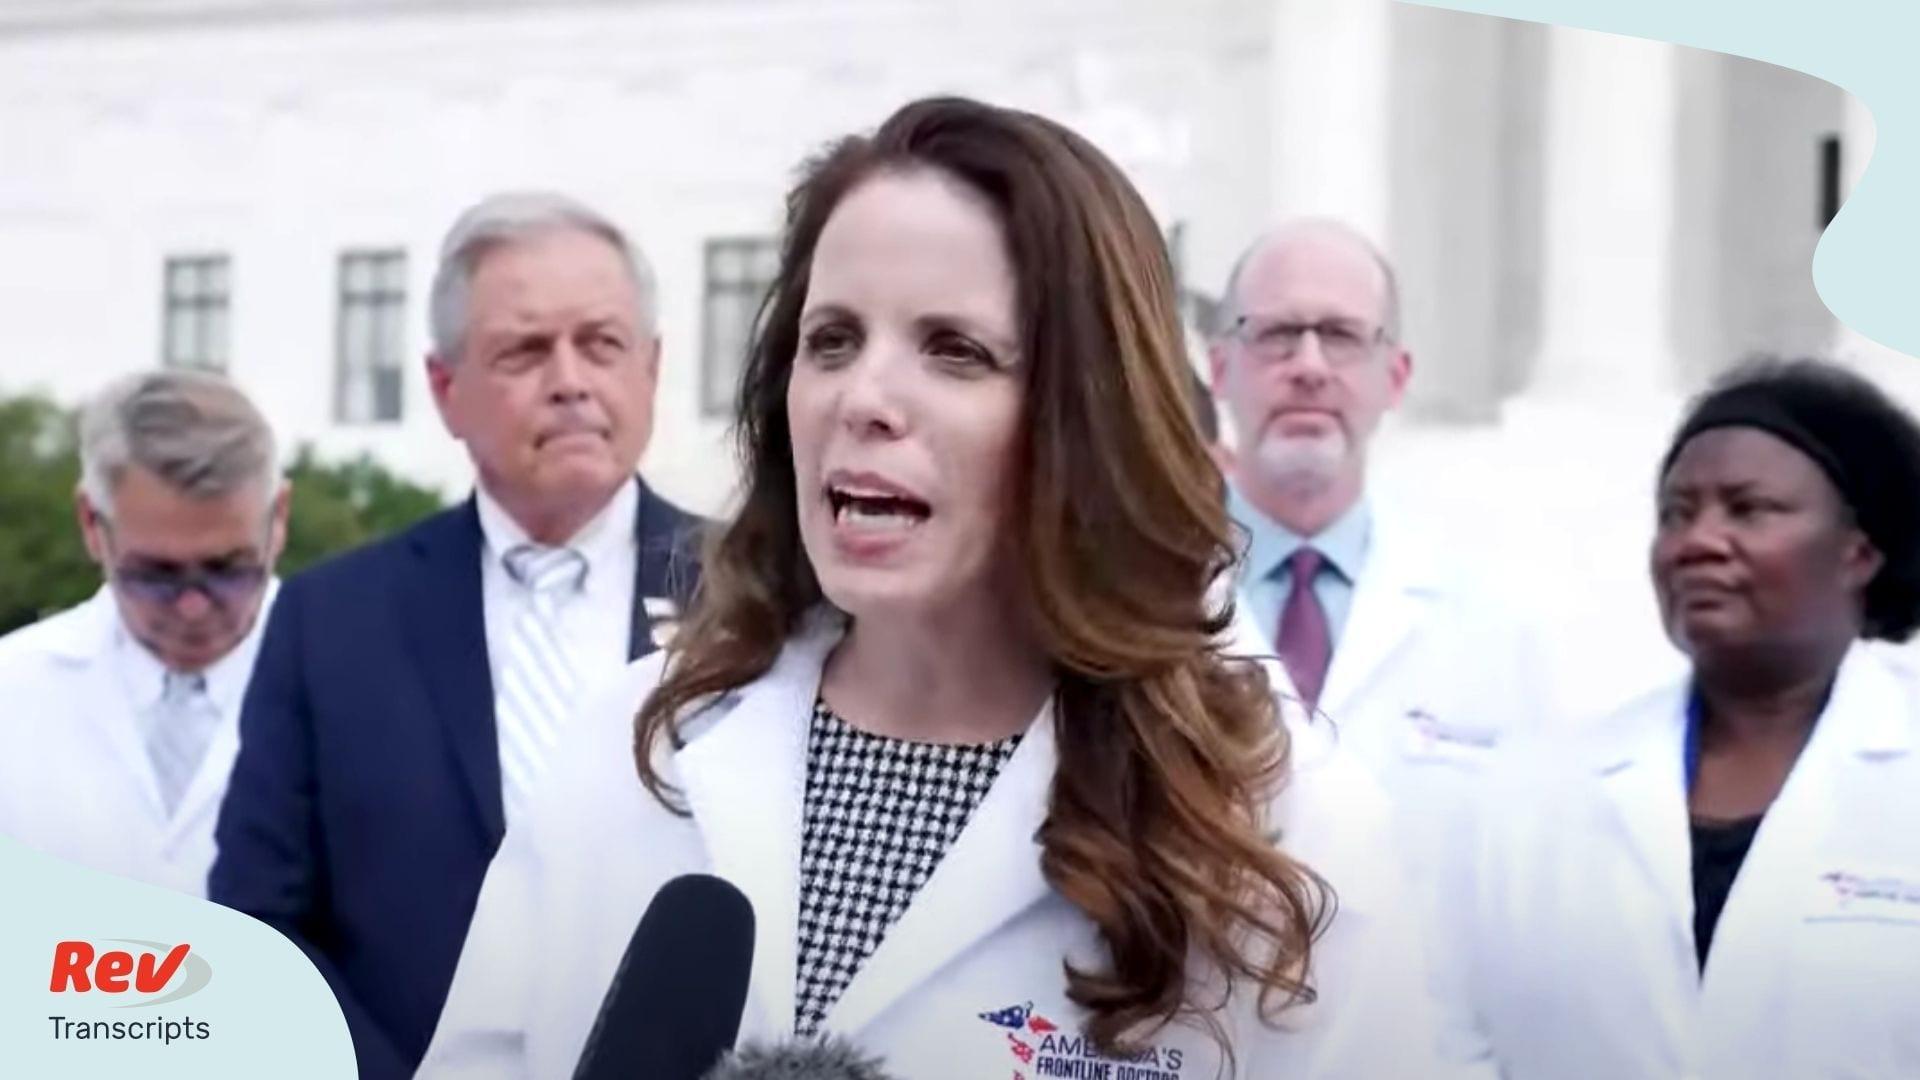 Americas-Frontline-Doctors-Press-Conference